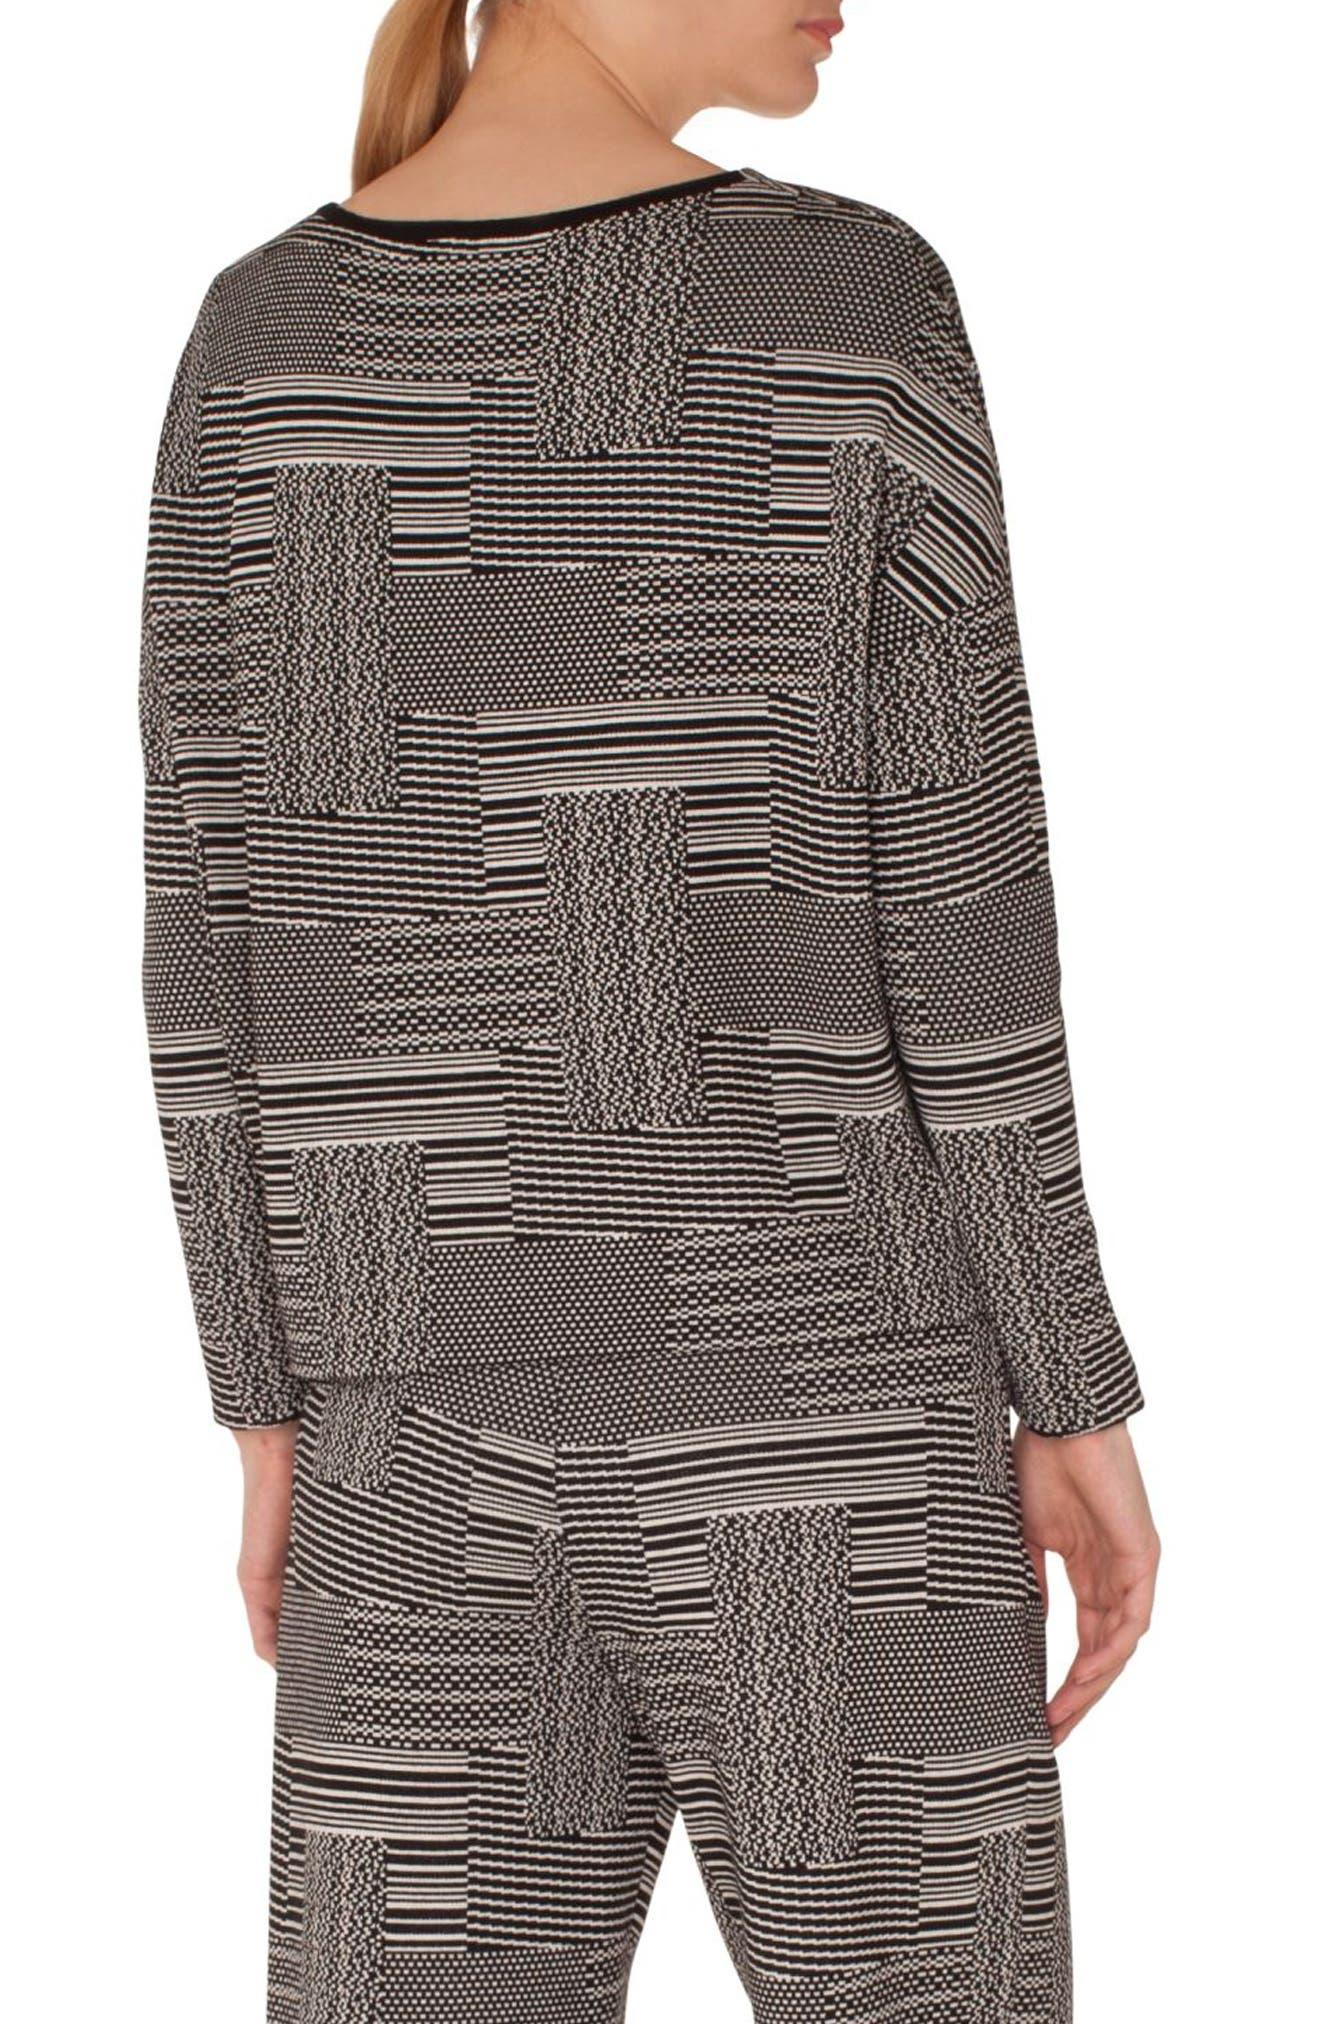 Wool & Cotton Patchwork Jacquard Top,                             Alternate thumbnail 2, color,                             BLACK-CREAM